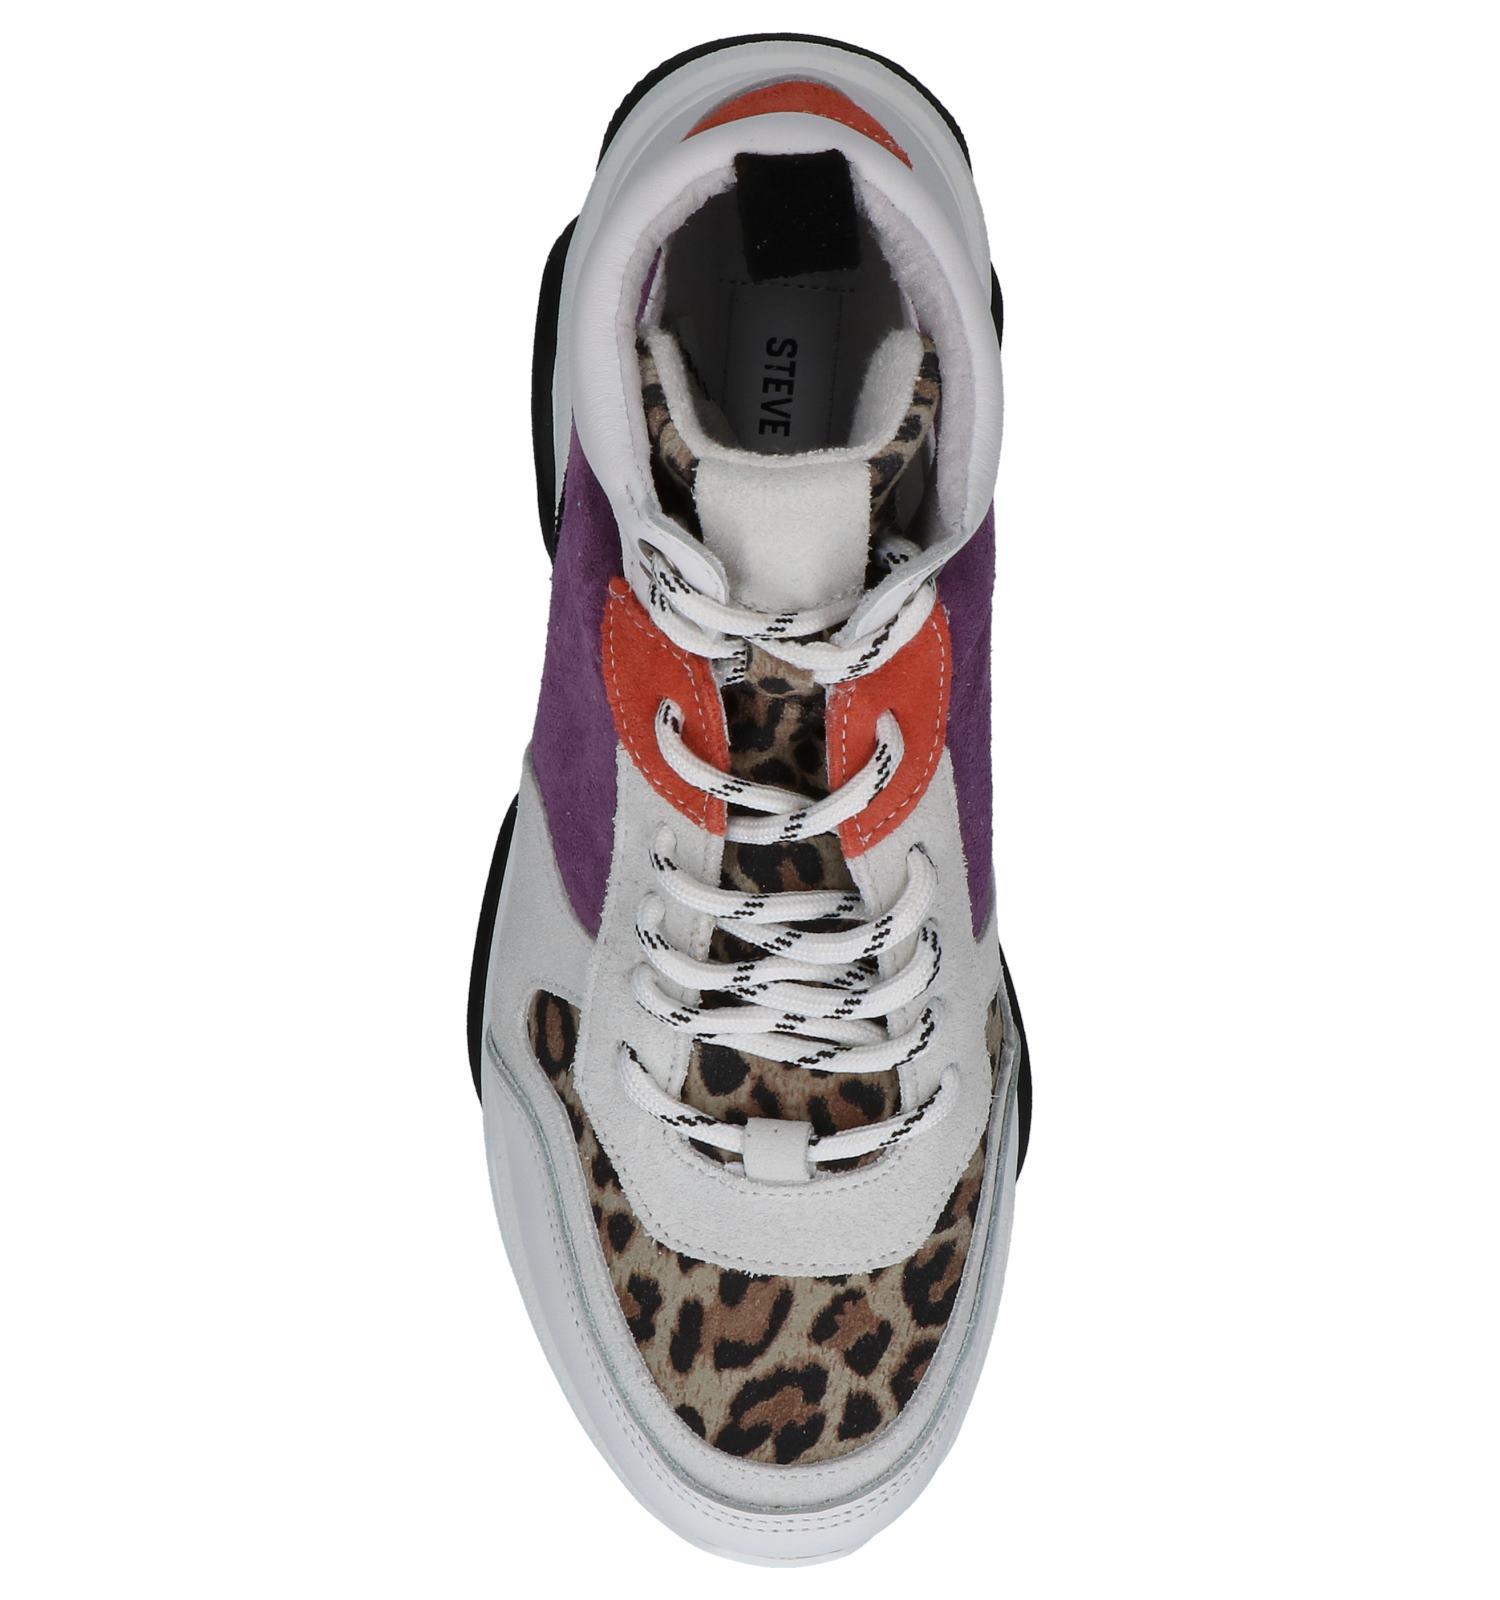 Zova Hoge Sneakers Madden Multicolor Steve VqzLGSUMp